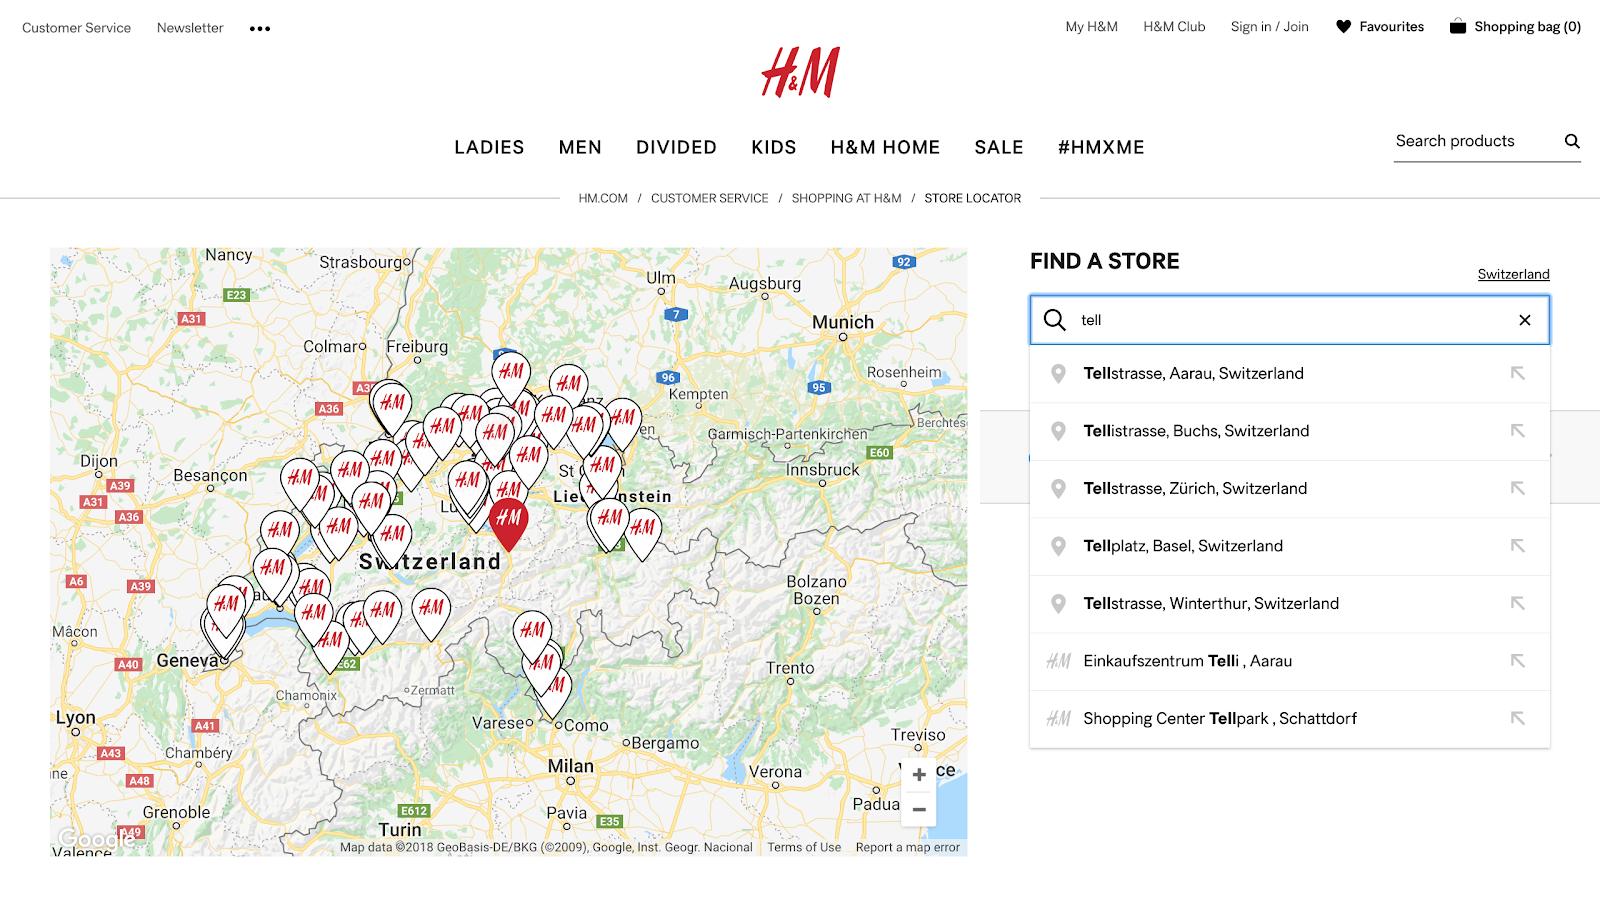 store-finder-best-practices-hm